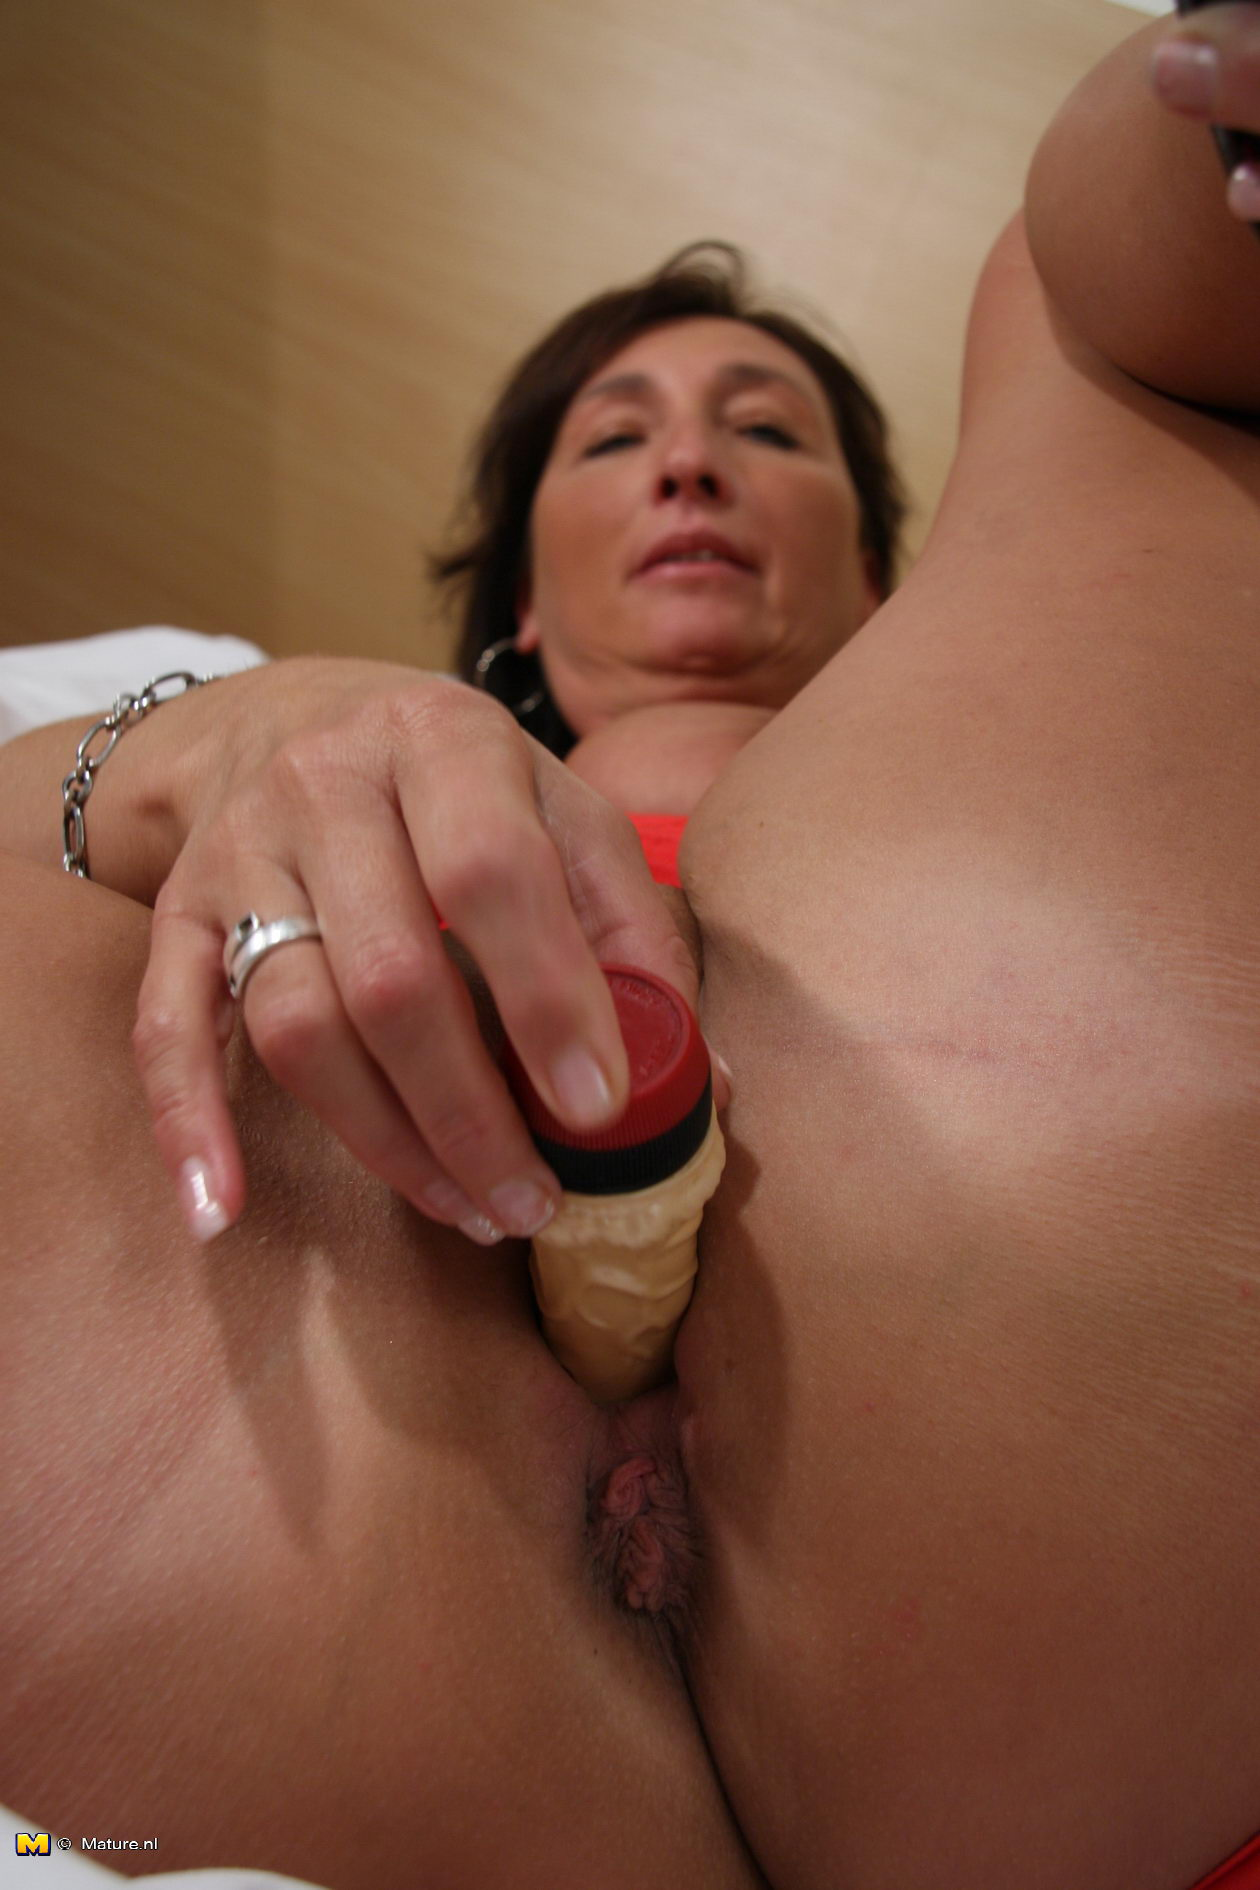 My wife wants a big dildo